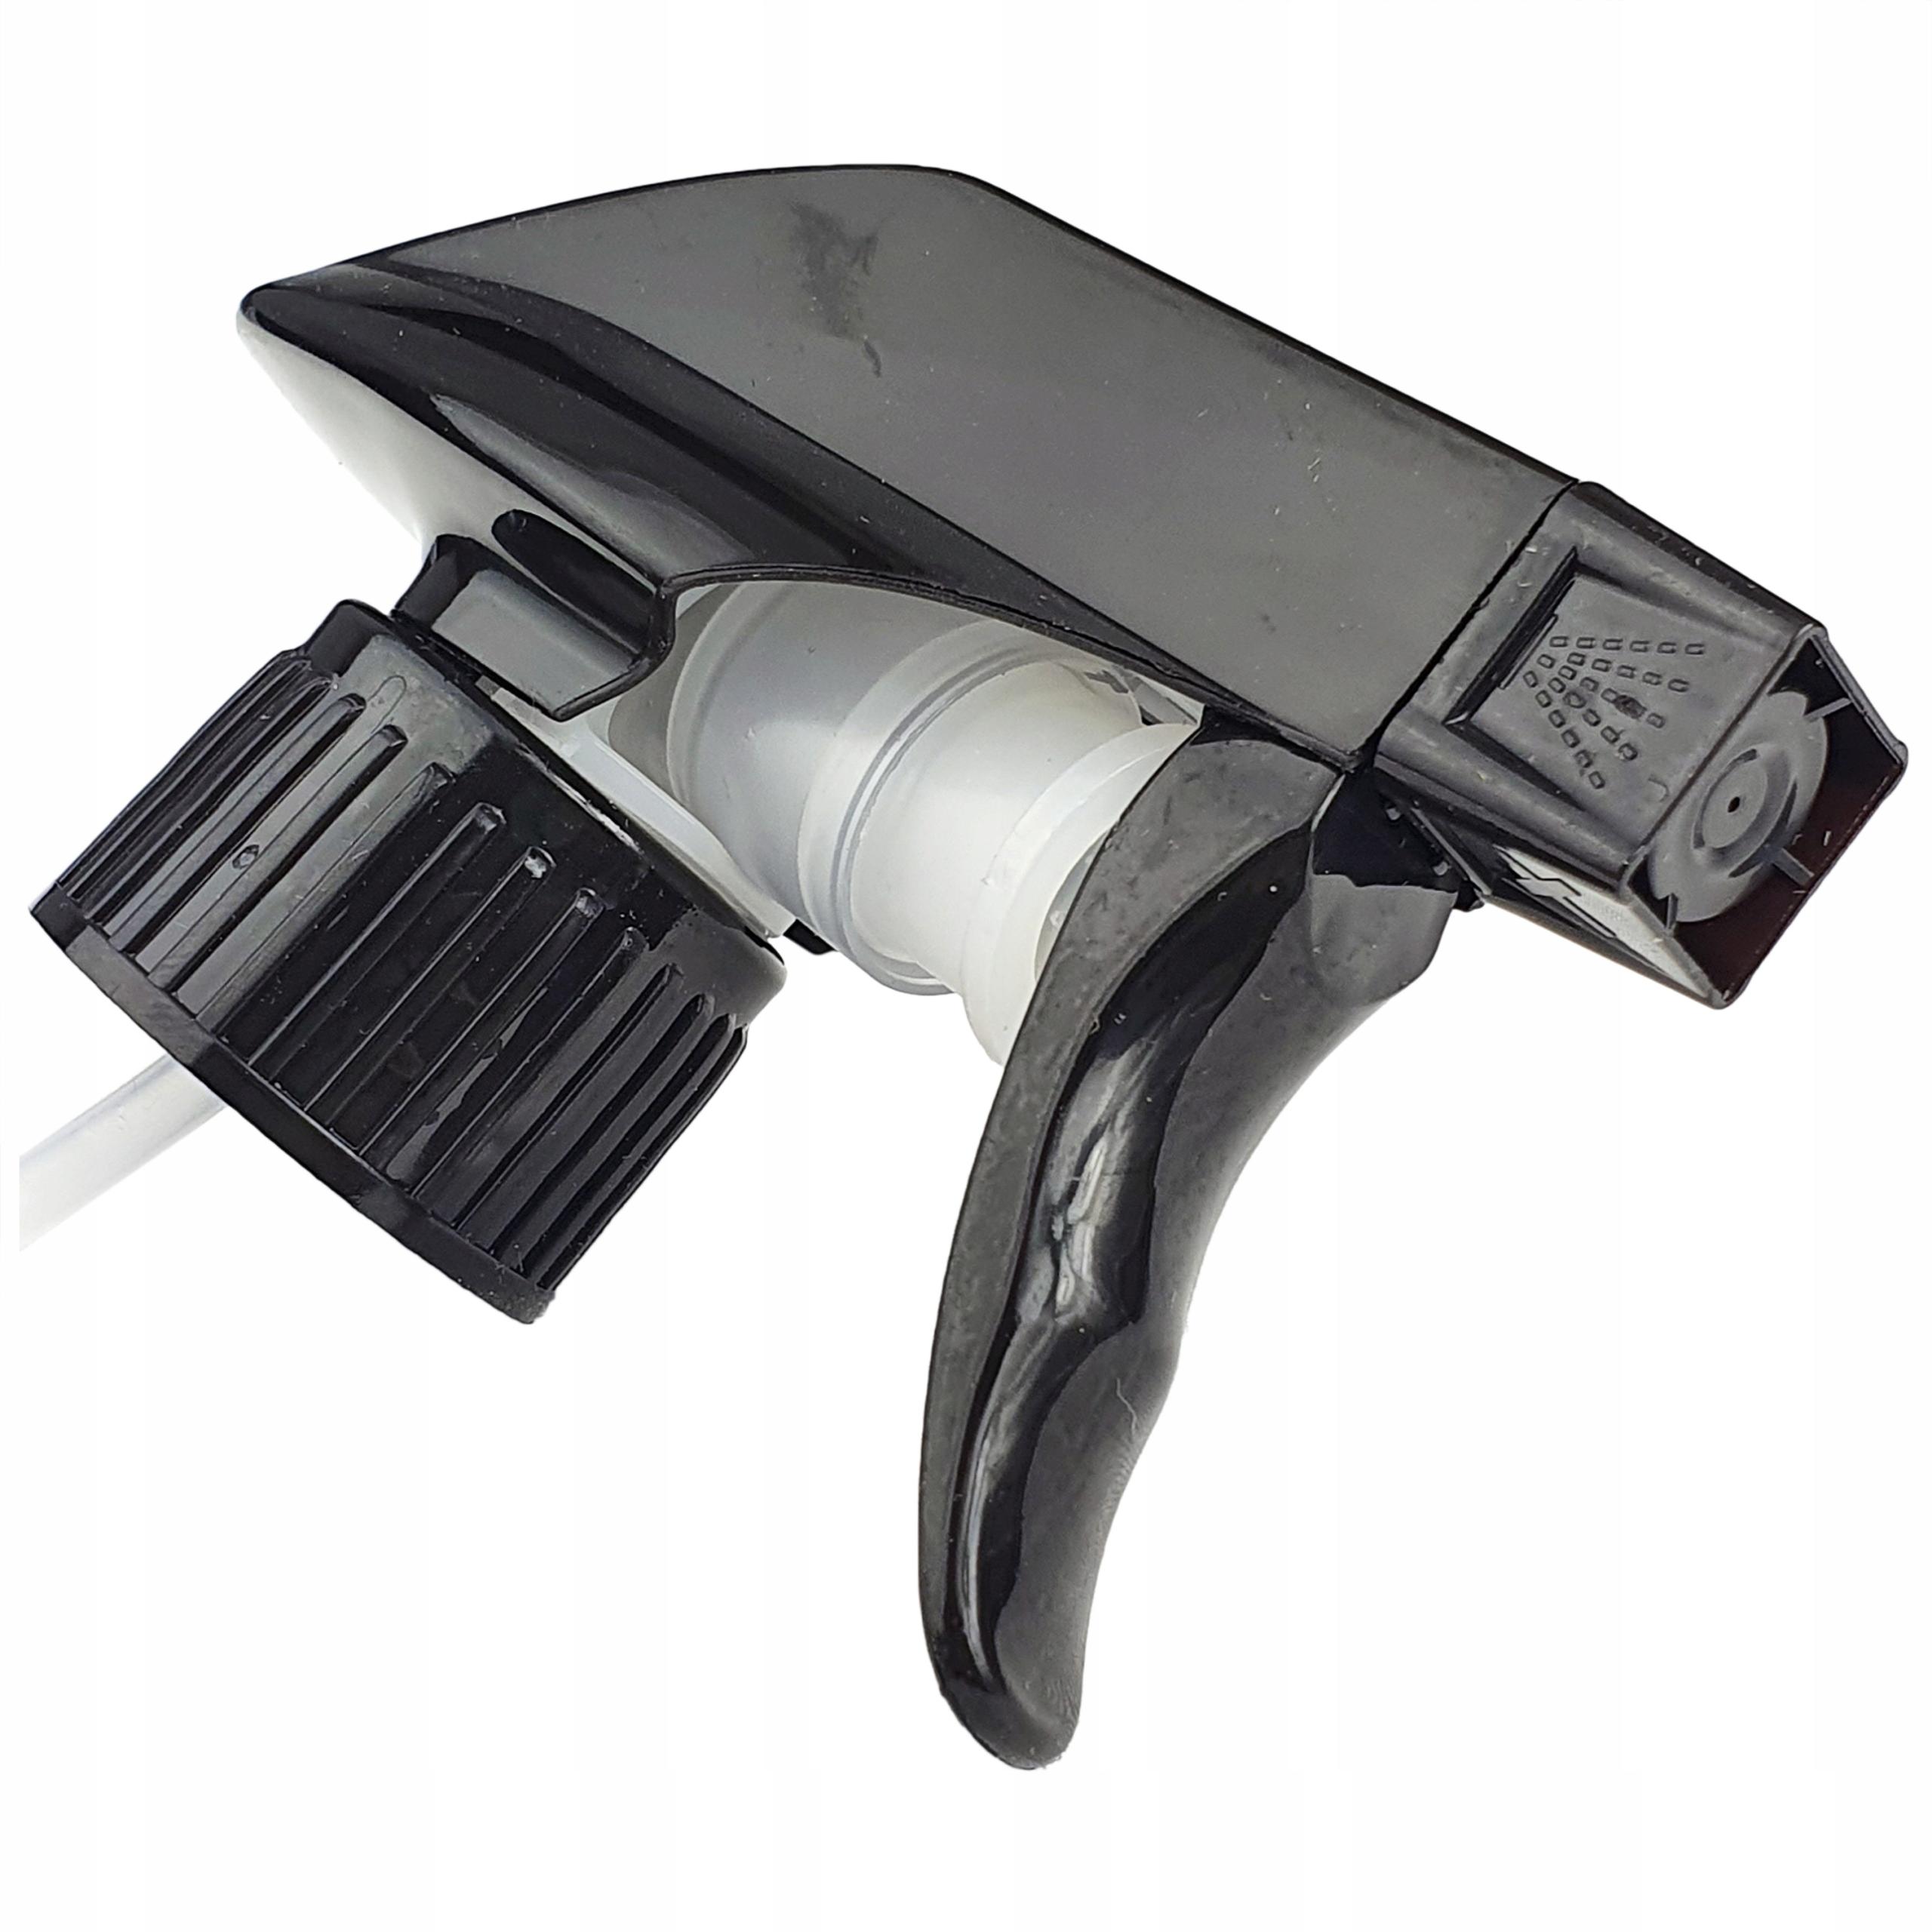 ADBL Interior Cleaner 1 L очиститель EAN 5902729001687